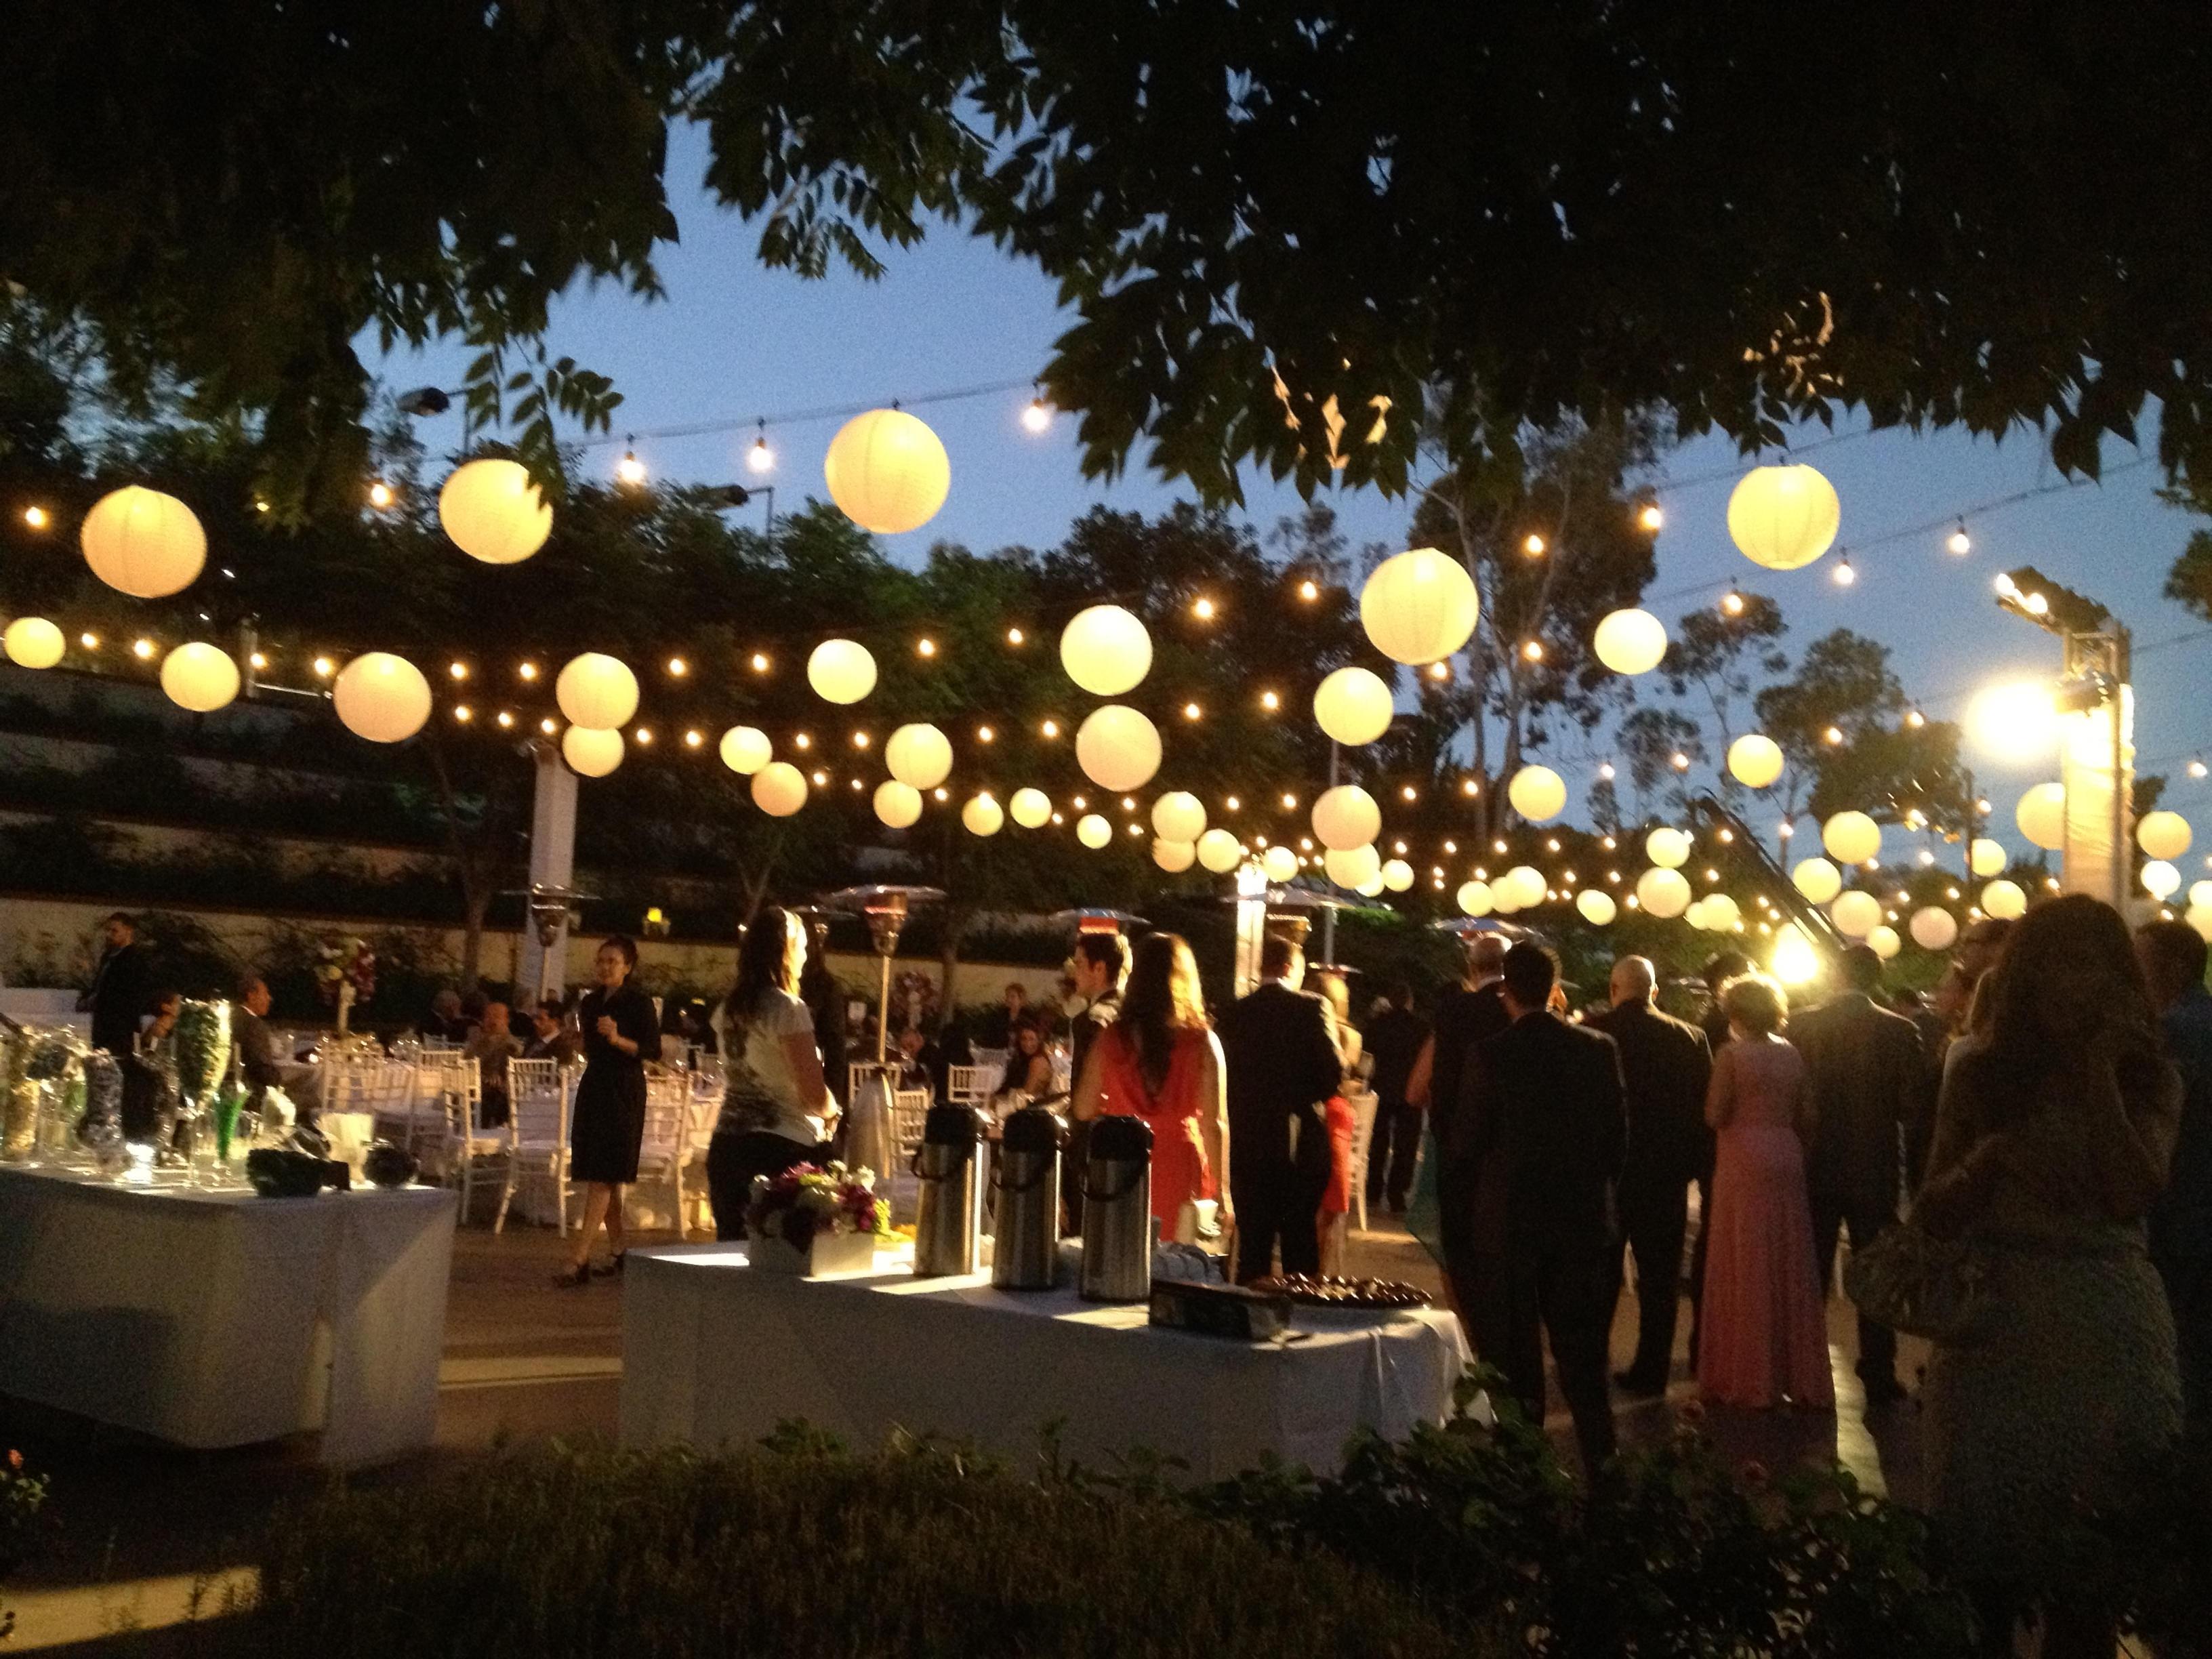 Outdoor Lanterns For Wedding Regarding Favorite Outdoor Lighting Wedding – Outdoor Lighting Ideas (View 10 of 20)